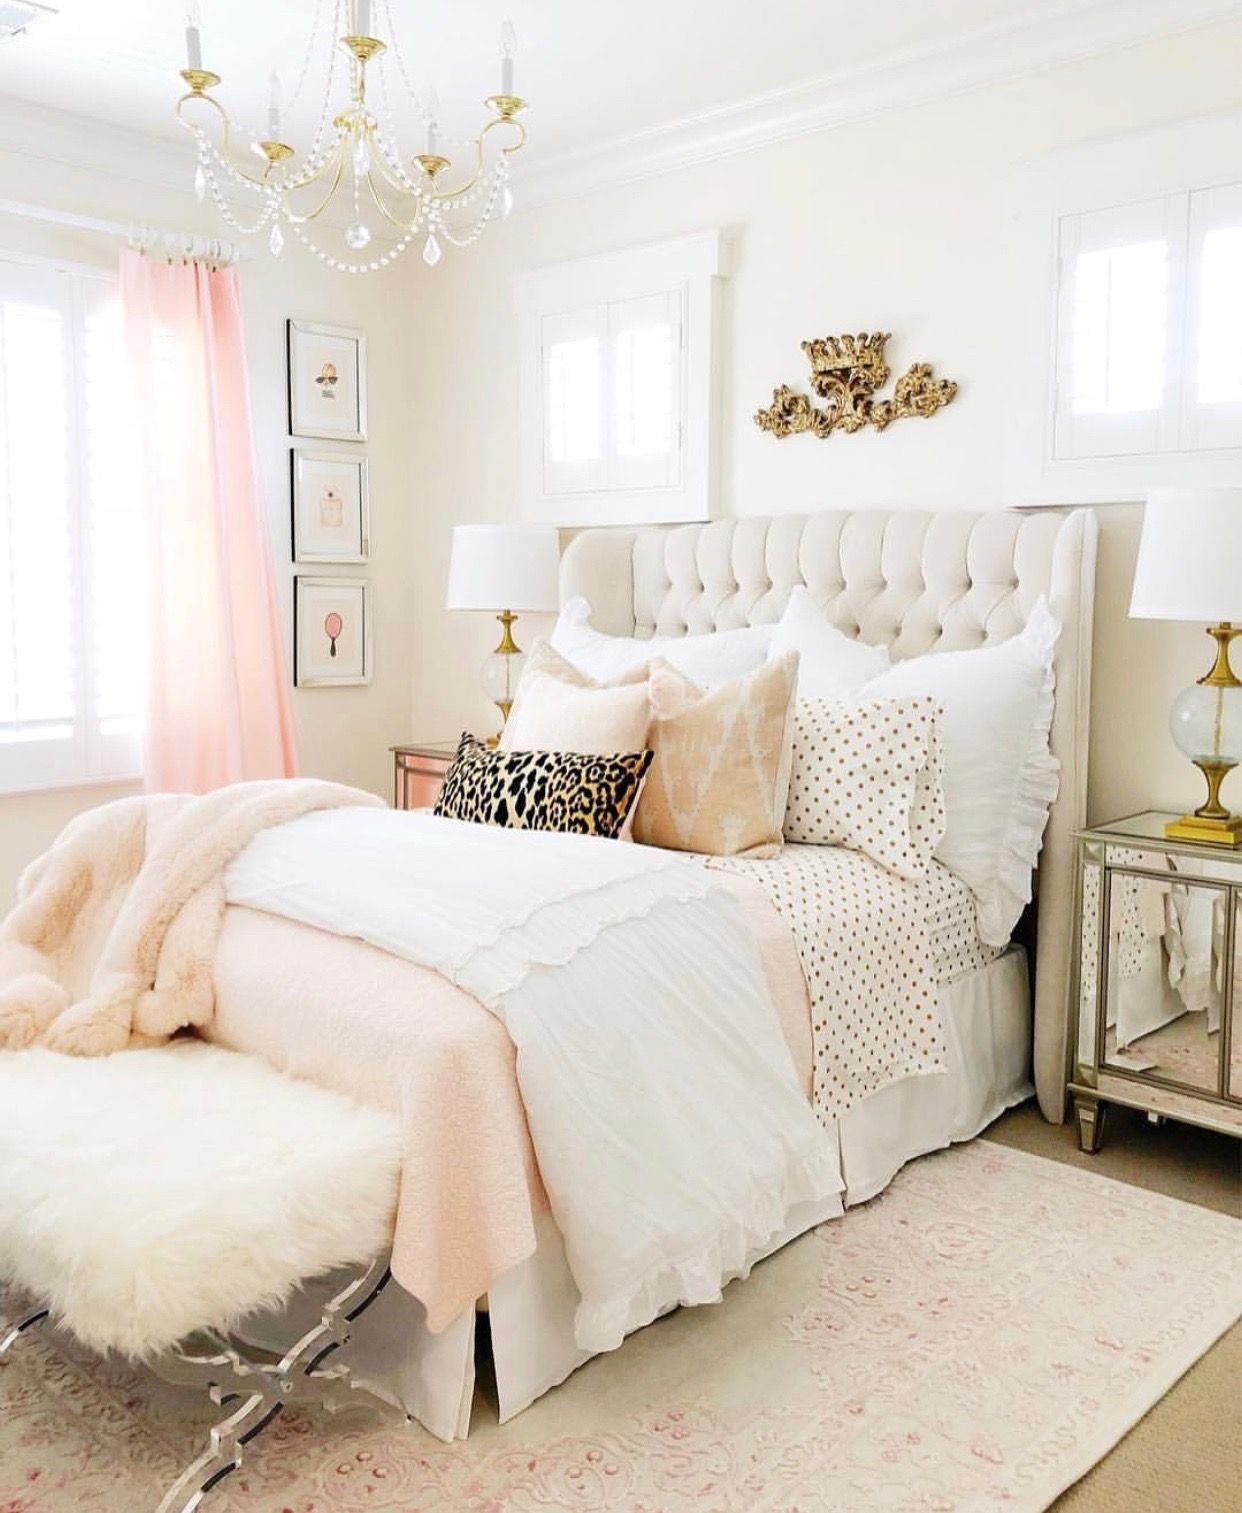 pin by wanda marin on guest house pink bedroom decor home decor rh pinterest com